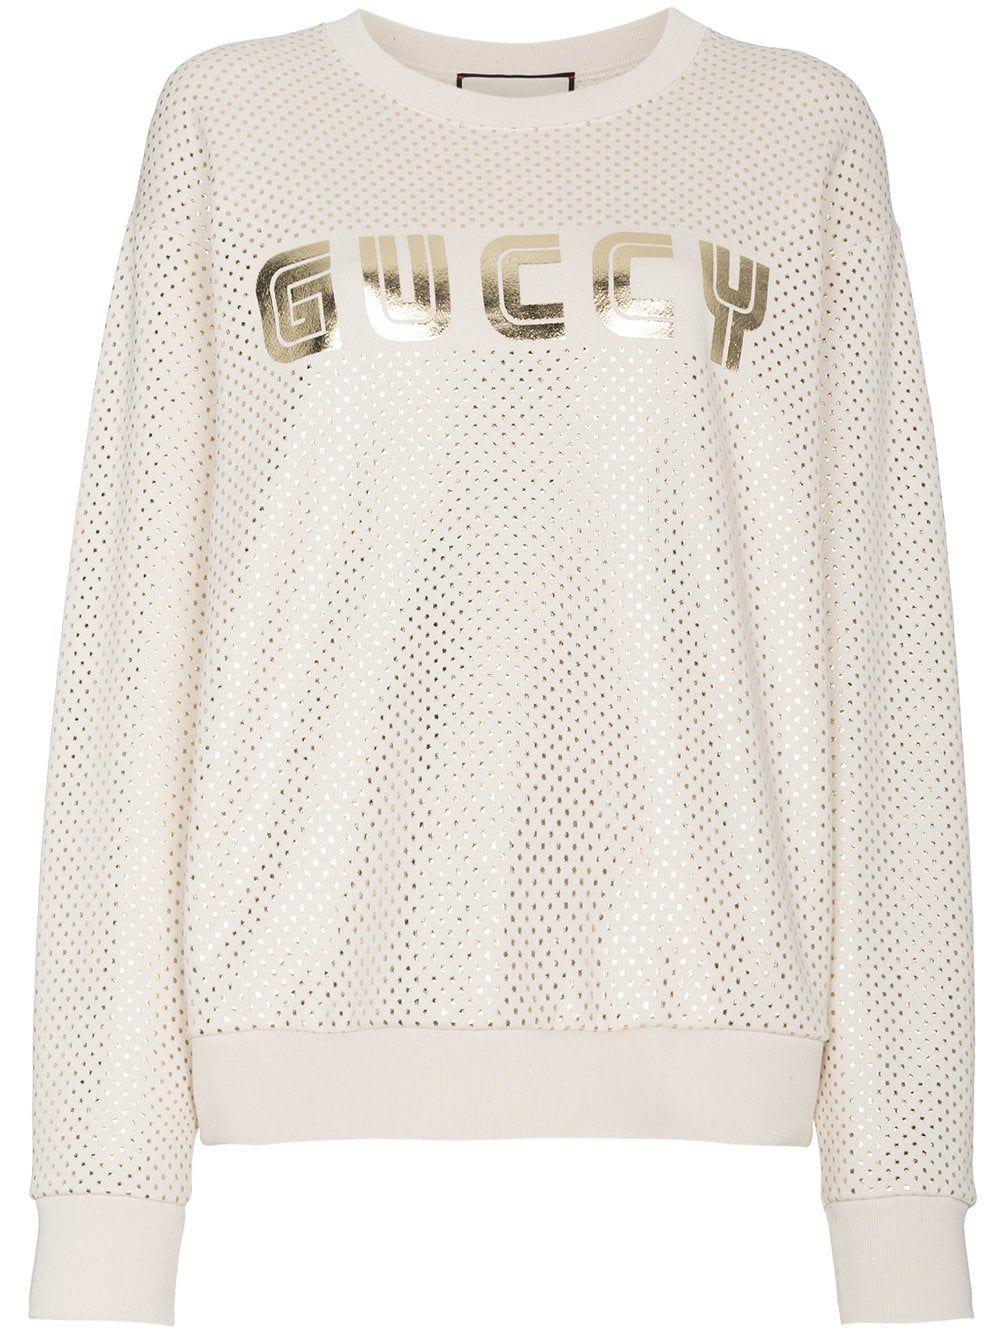 c14a003f010 Gucci Metallic Logo Sweatshirt In Neutrals